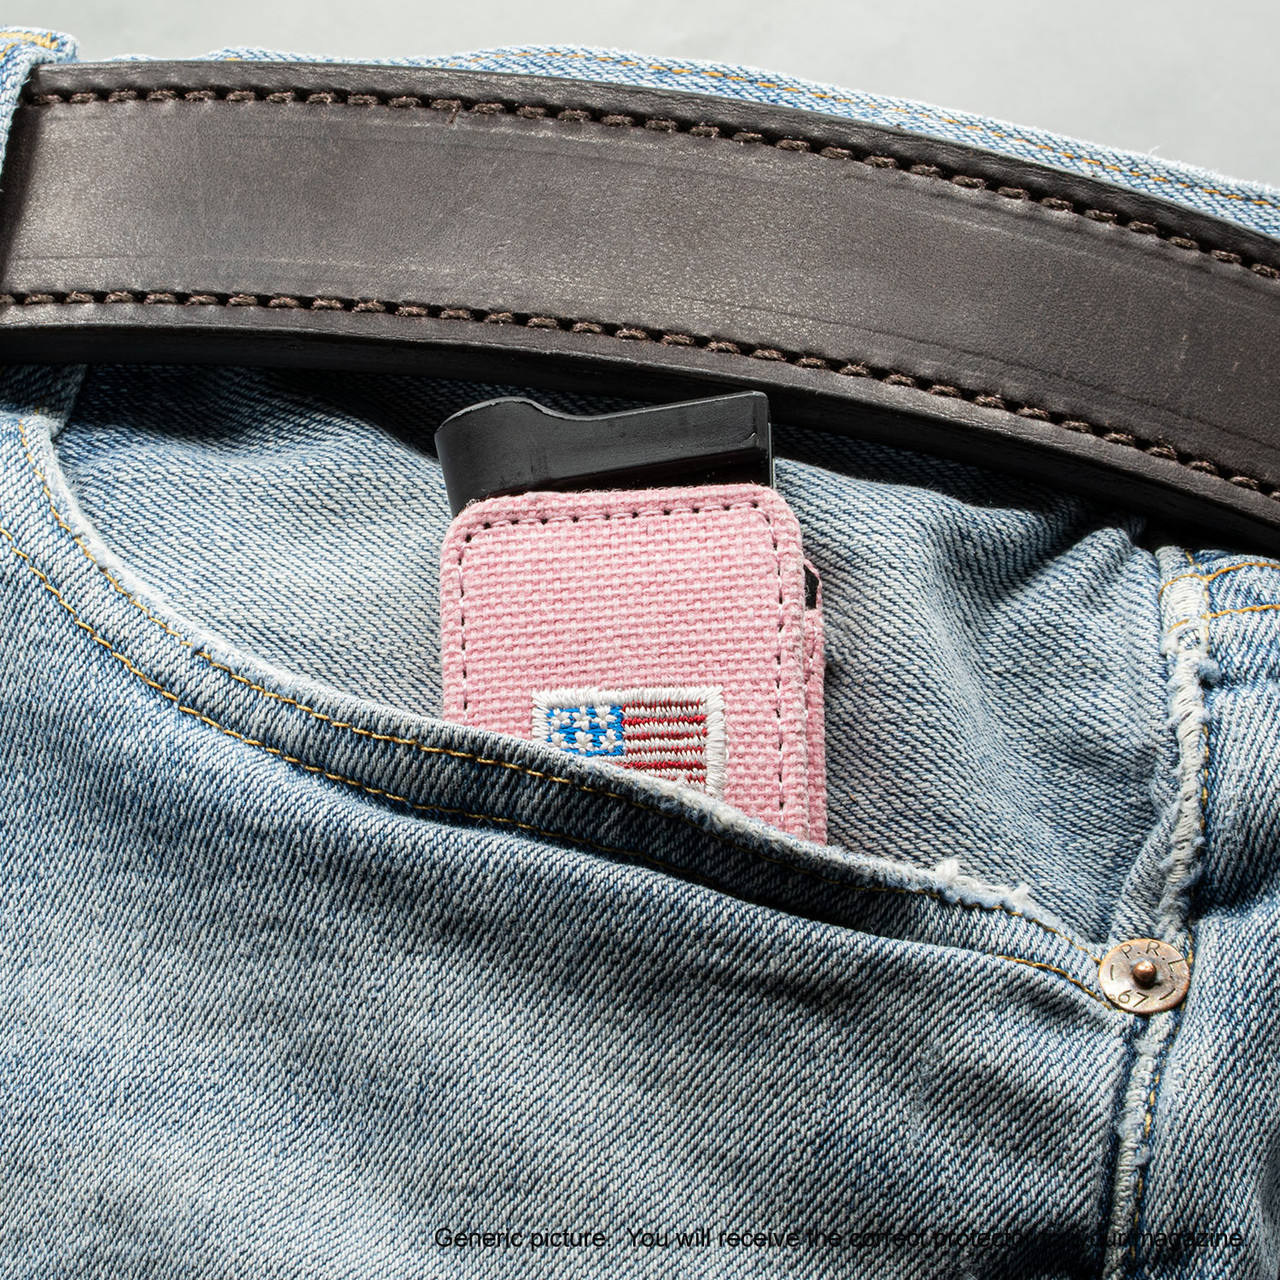 CZ P-10 C Pink Canvas Flag Magazine Pocket Protector